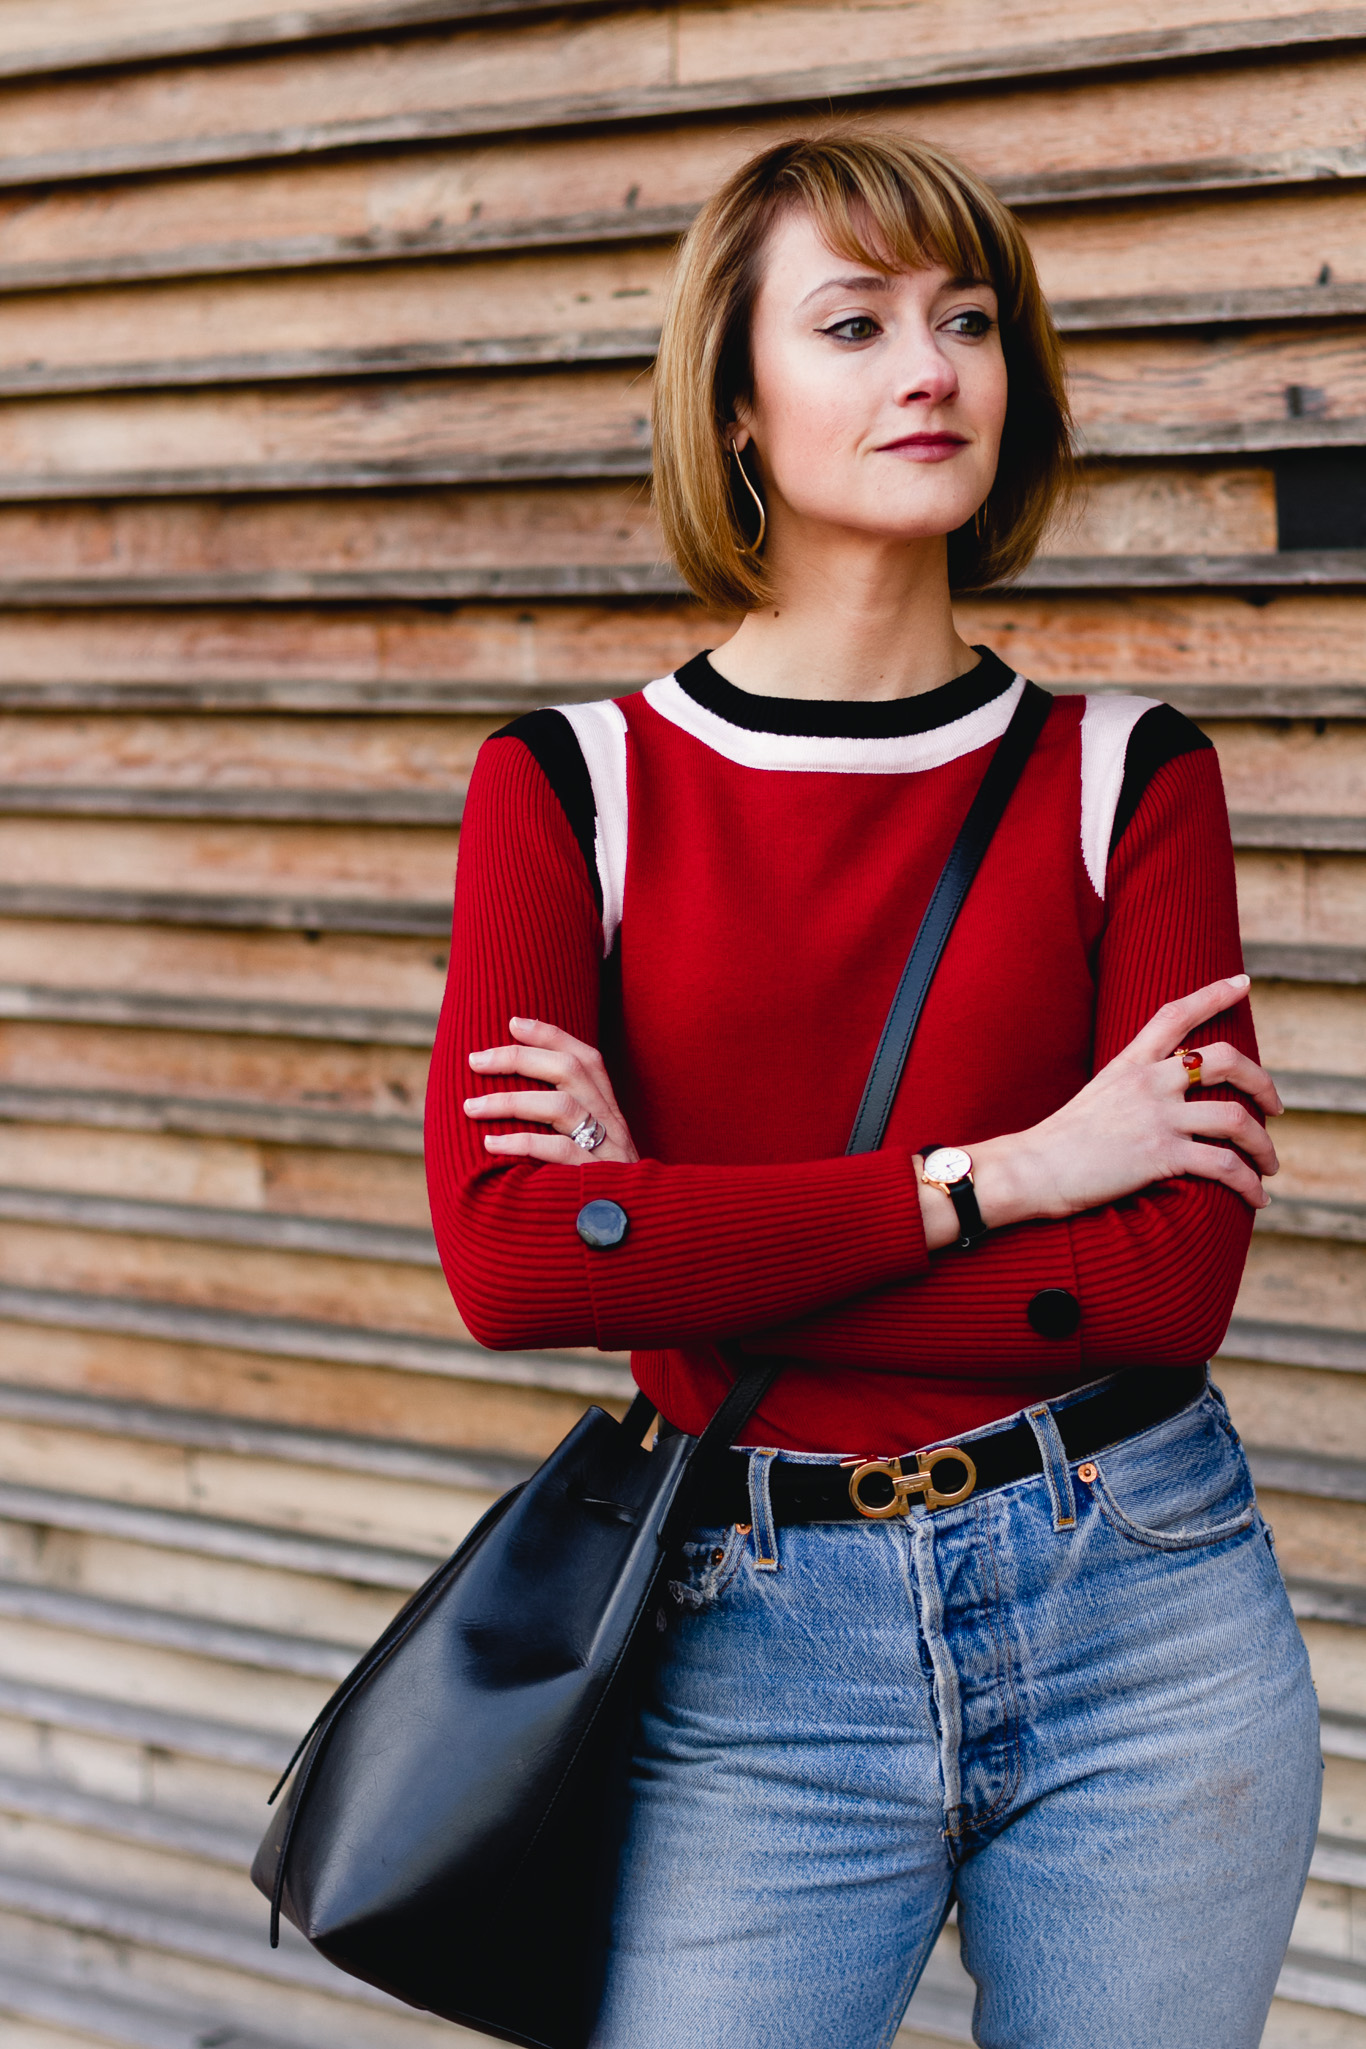 Marni sweater, Ferragamo belt, and Mansur Gavriel bag